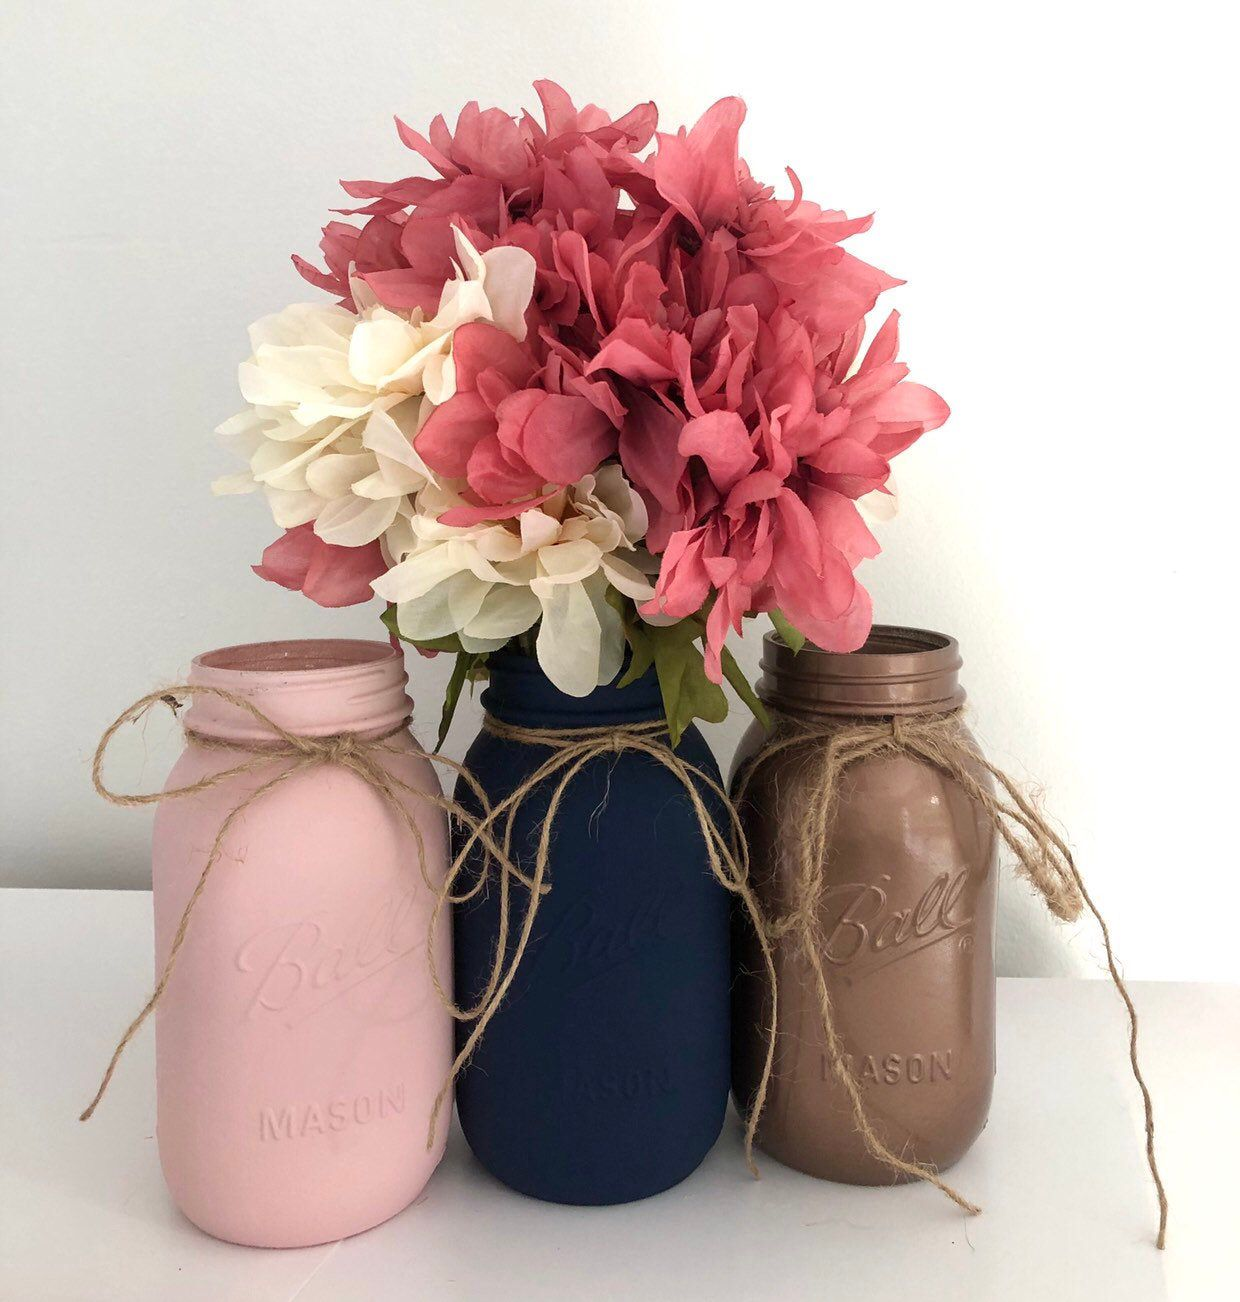 3 Ombré Navy Blue, Blush Pink And Rose Gold Mason Jar